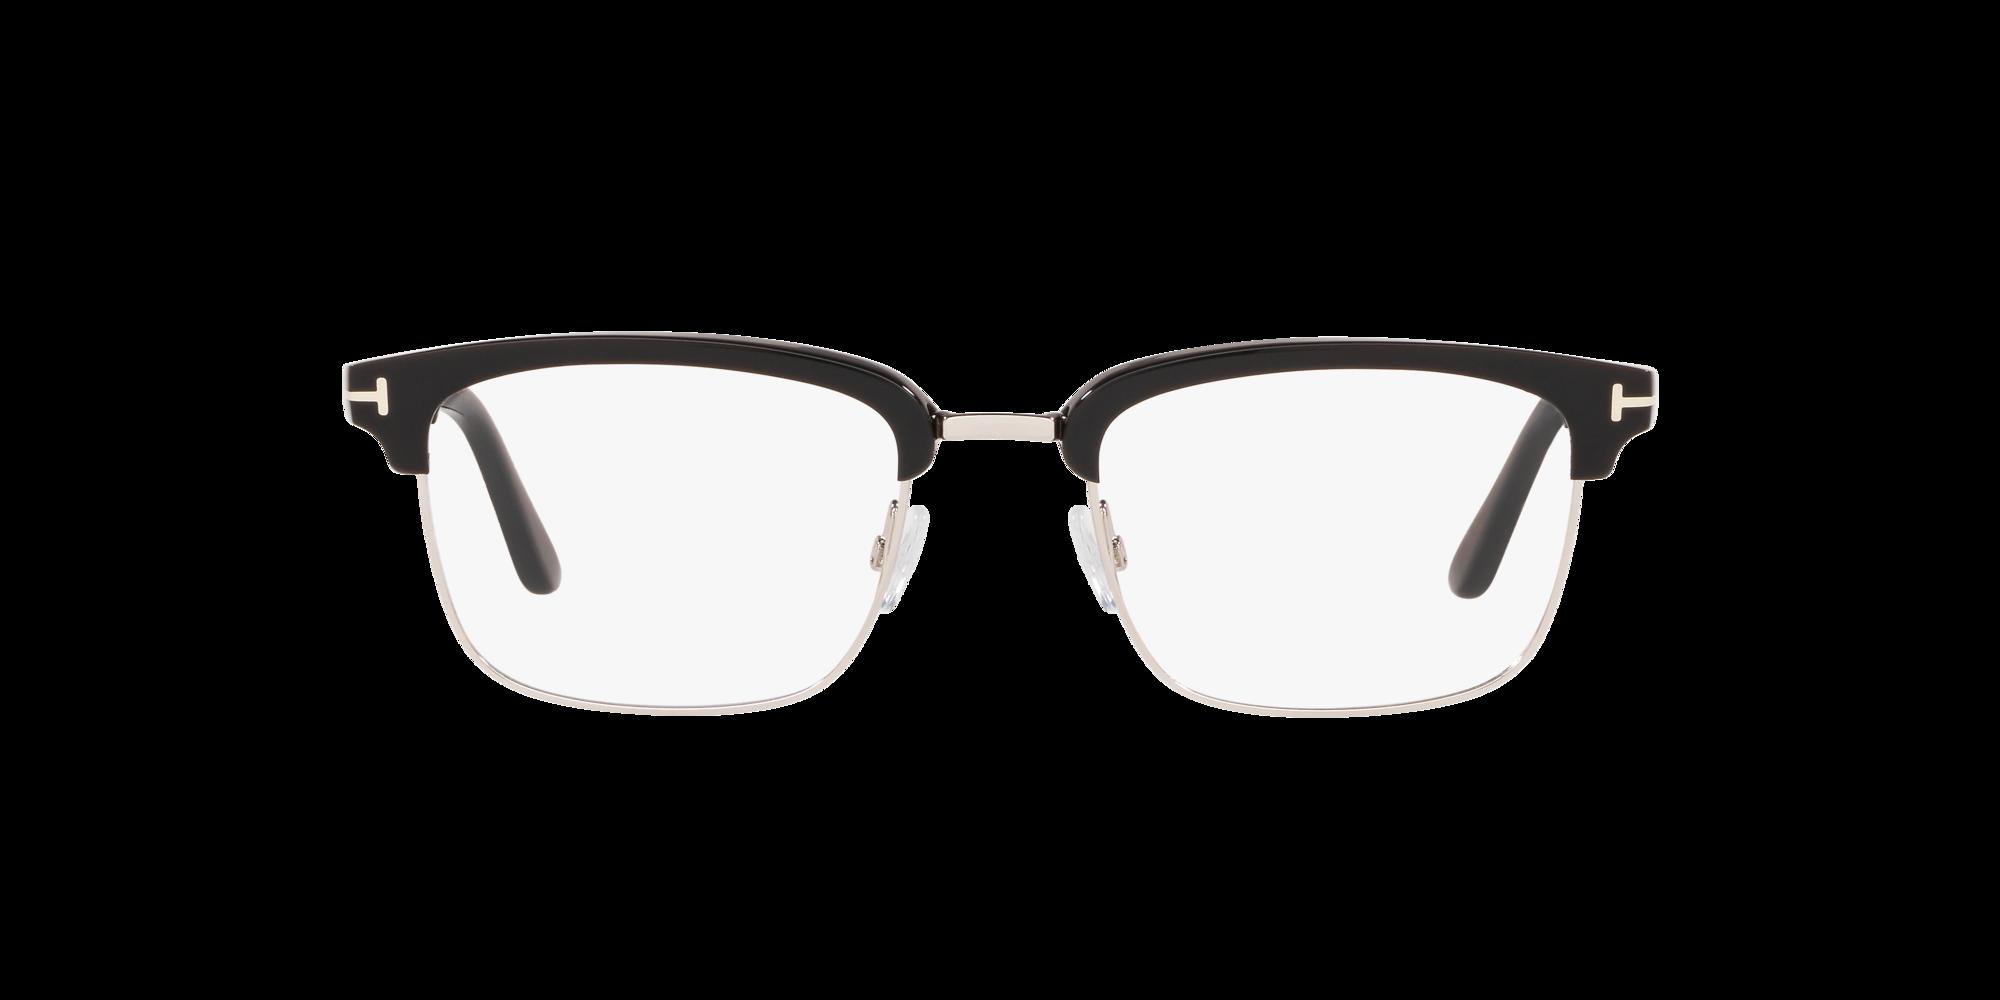 Image for FT5504 from LensCrafters | Glasses, Prescription Glasses Online, Eyewear